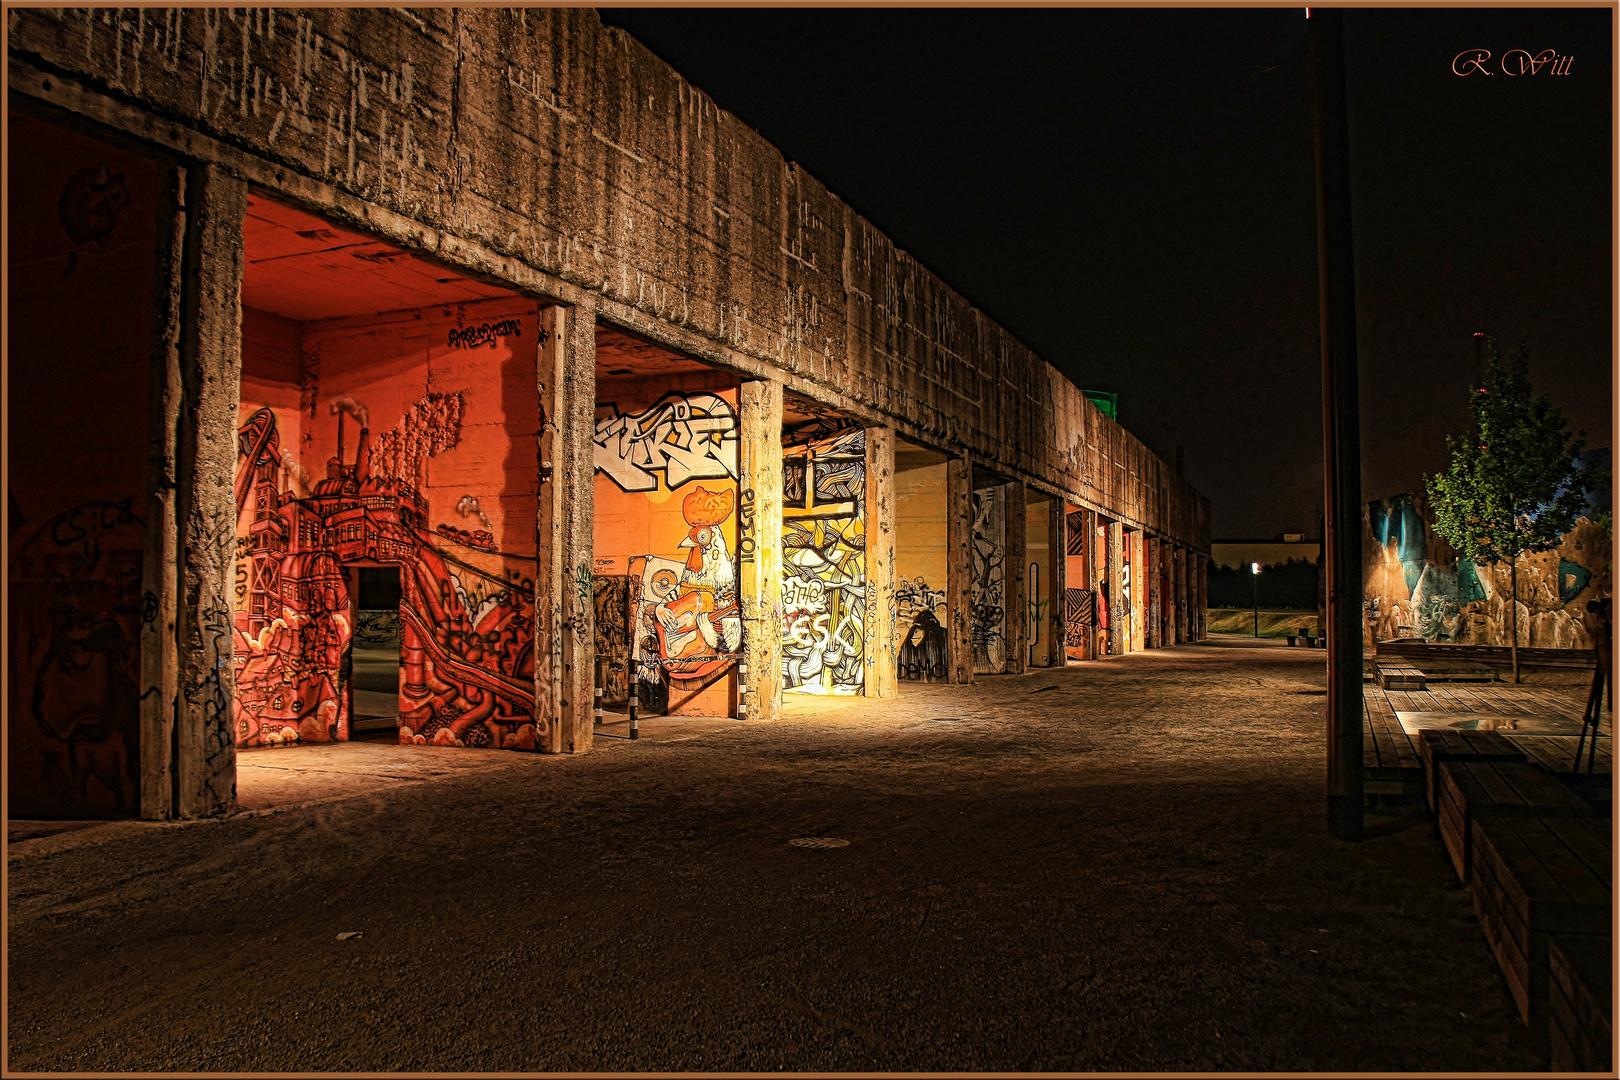 Graffiti Kunst im Rheinpark Duisburg